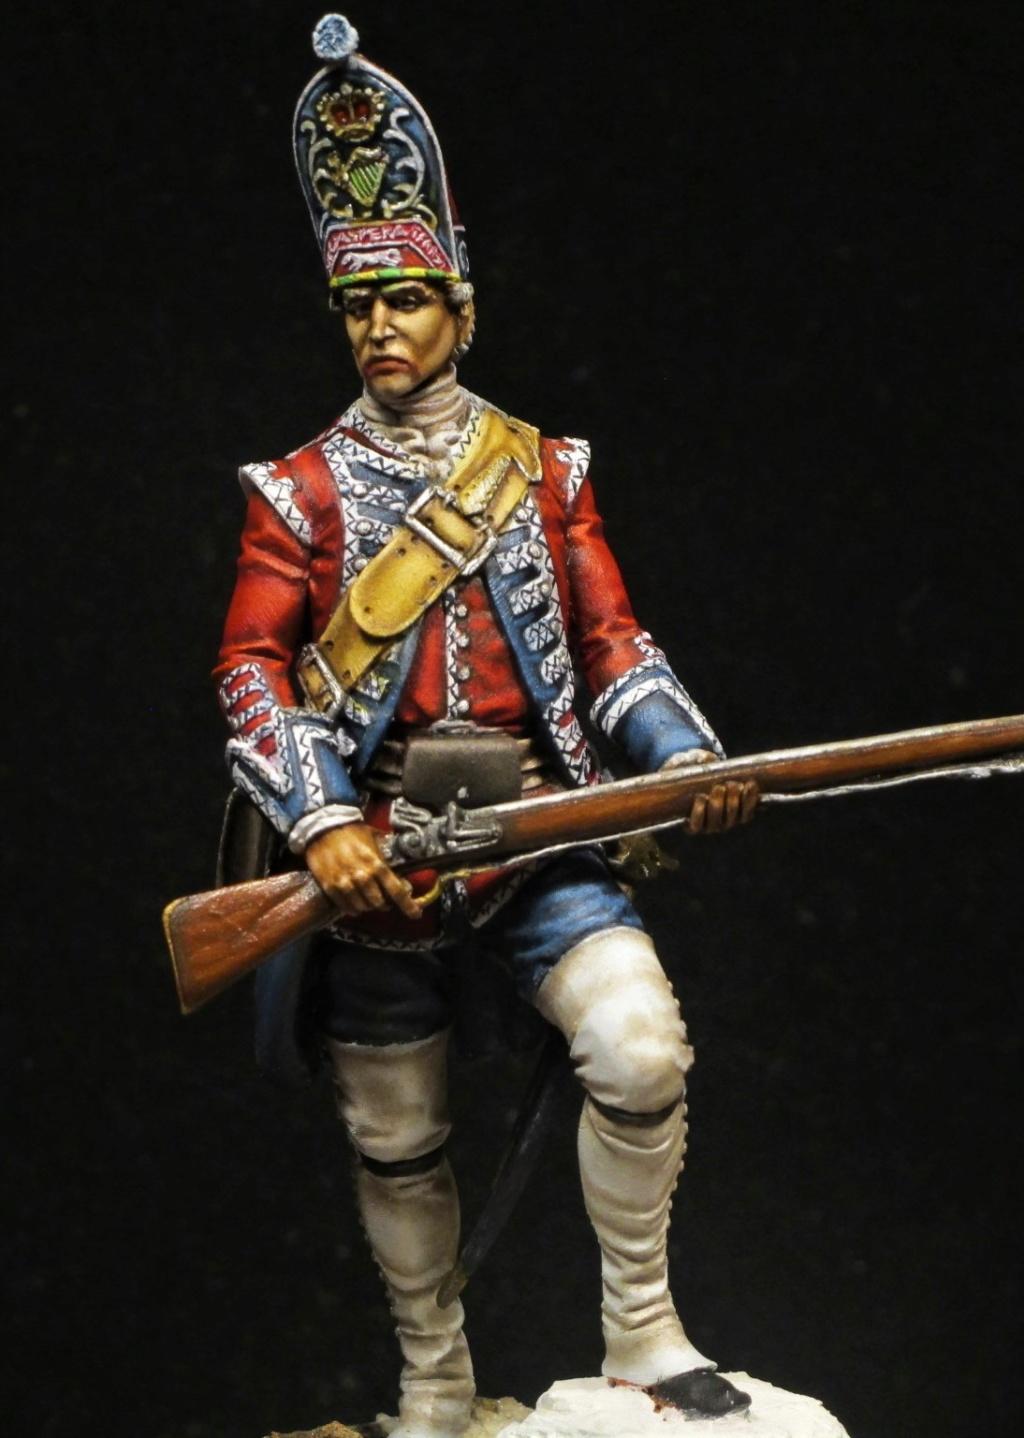 grenadier anglais du 18th Foot en 1751 Img_1211